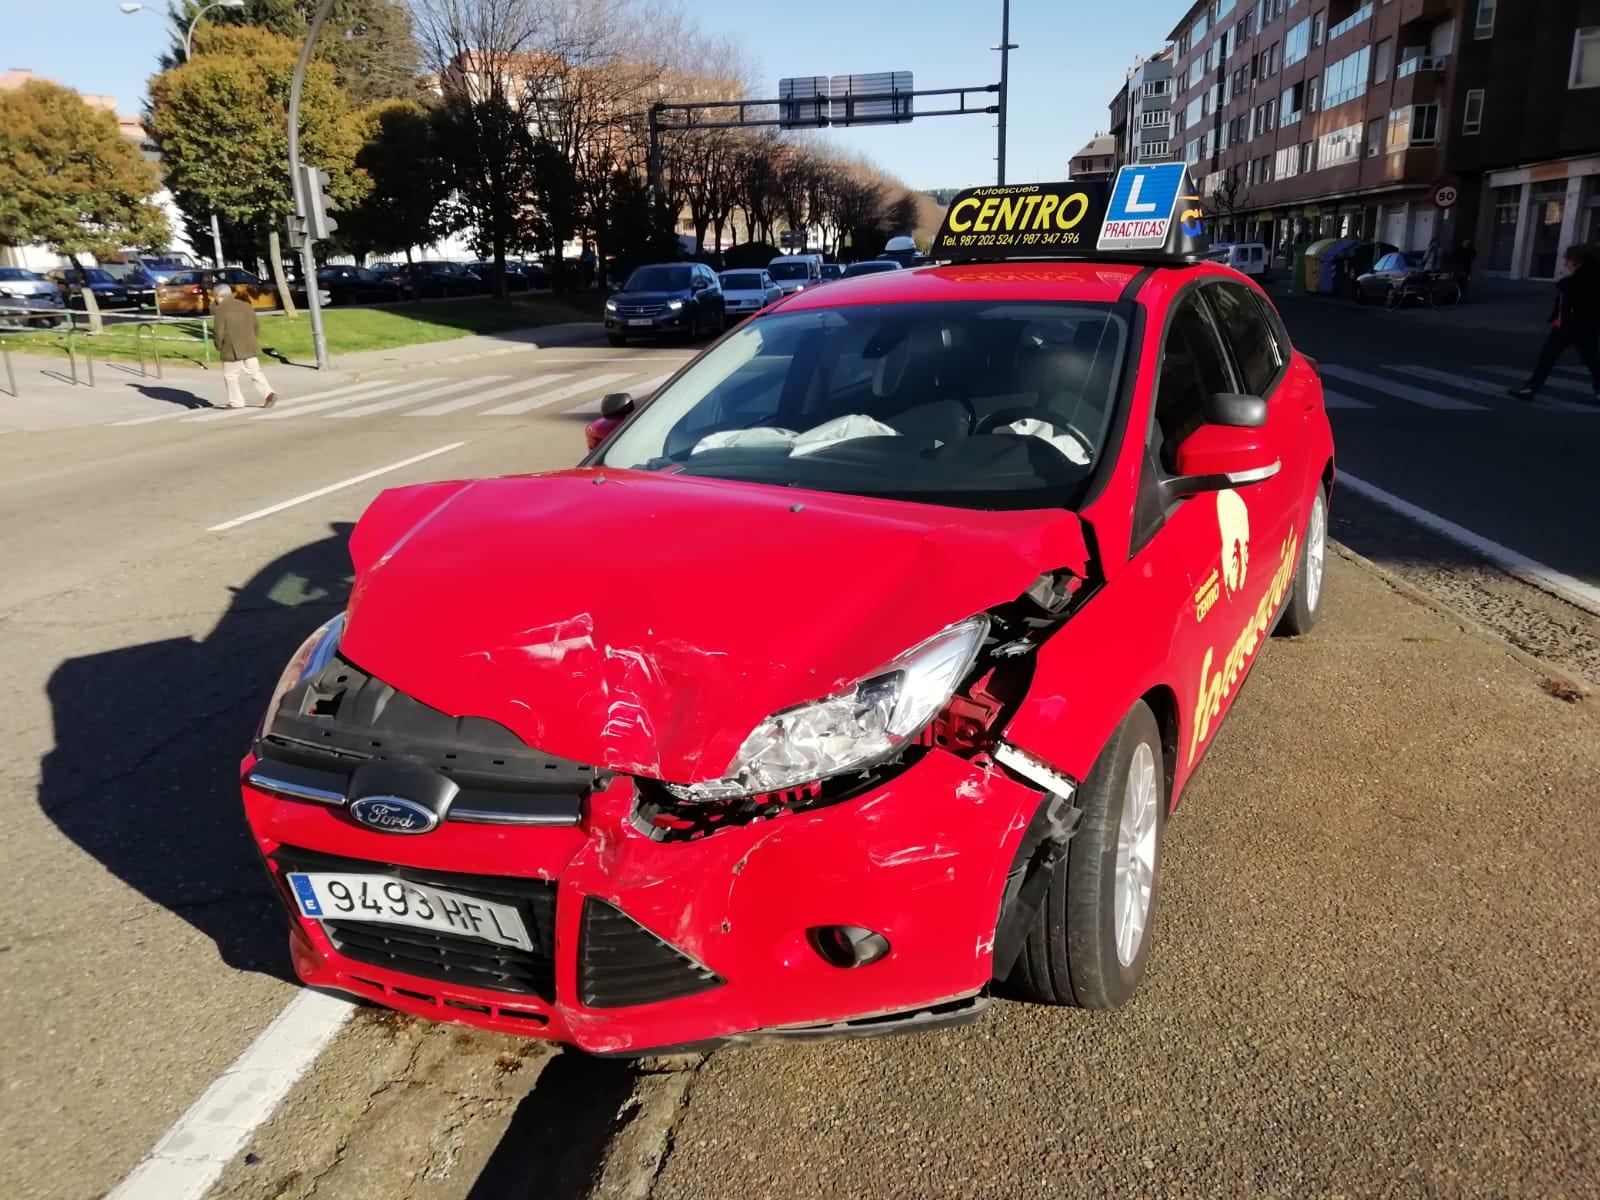 Se empotra contra un coche de autoescuela en León capital